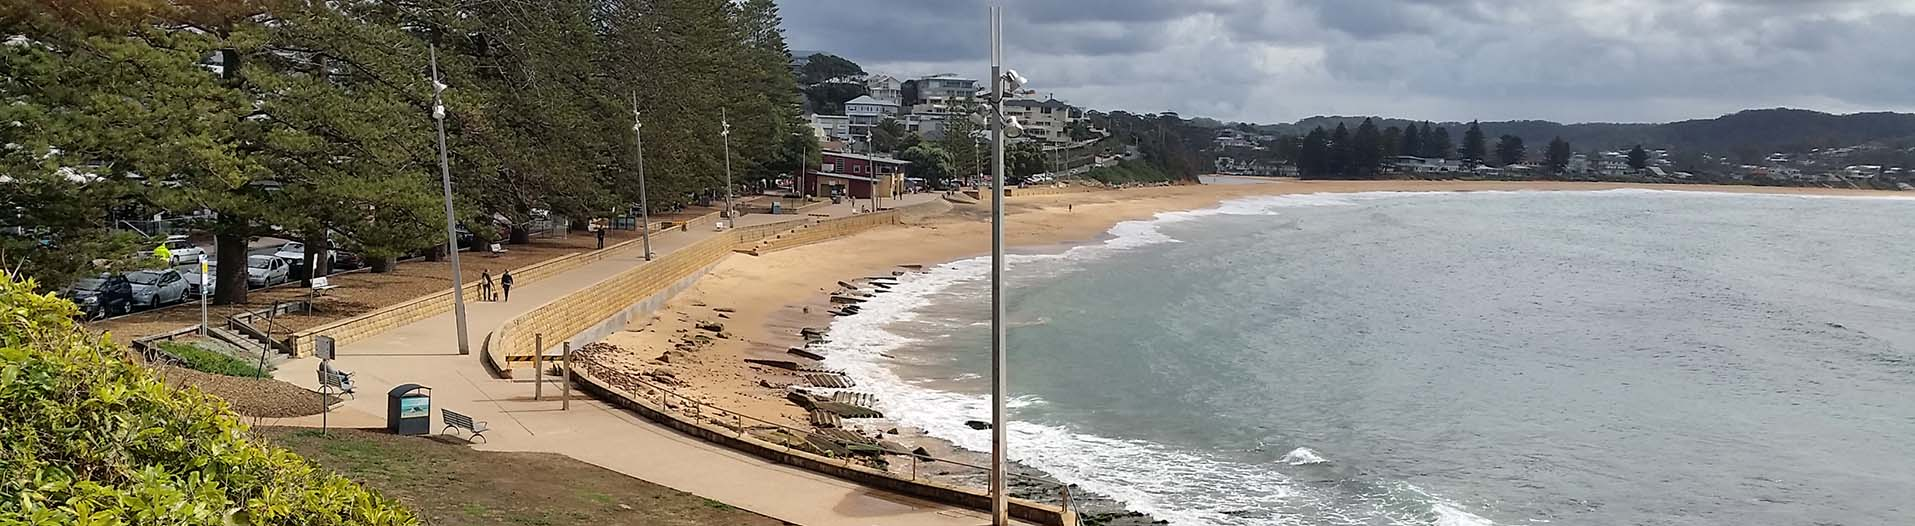 Terrigal-Beachfront.jpg